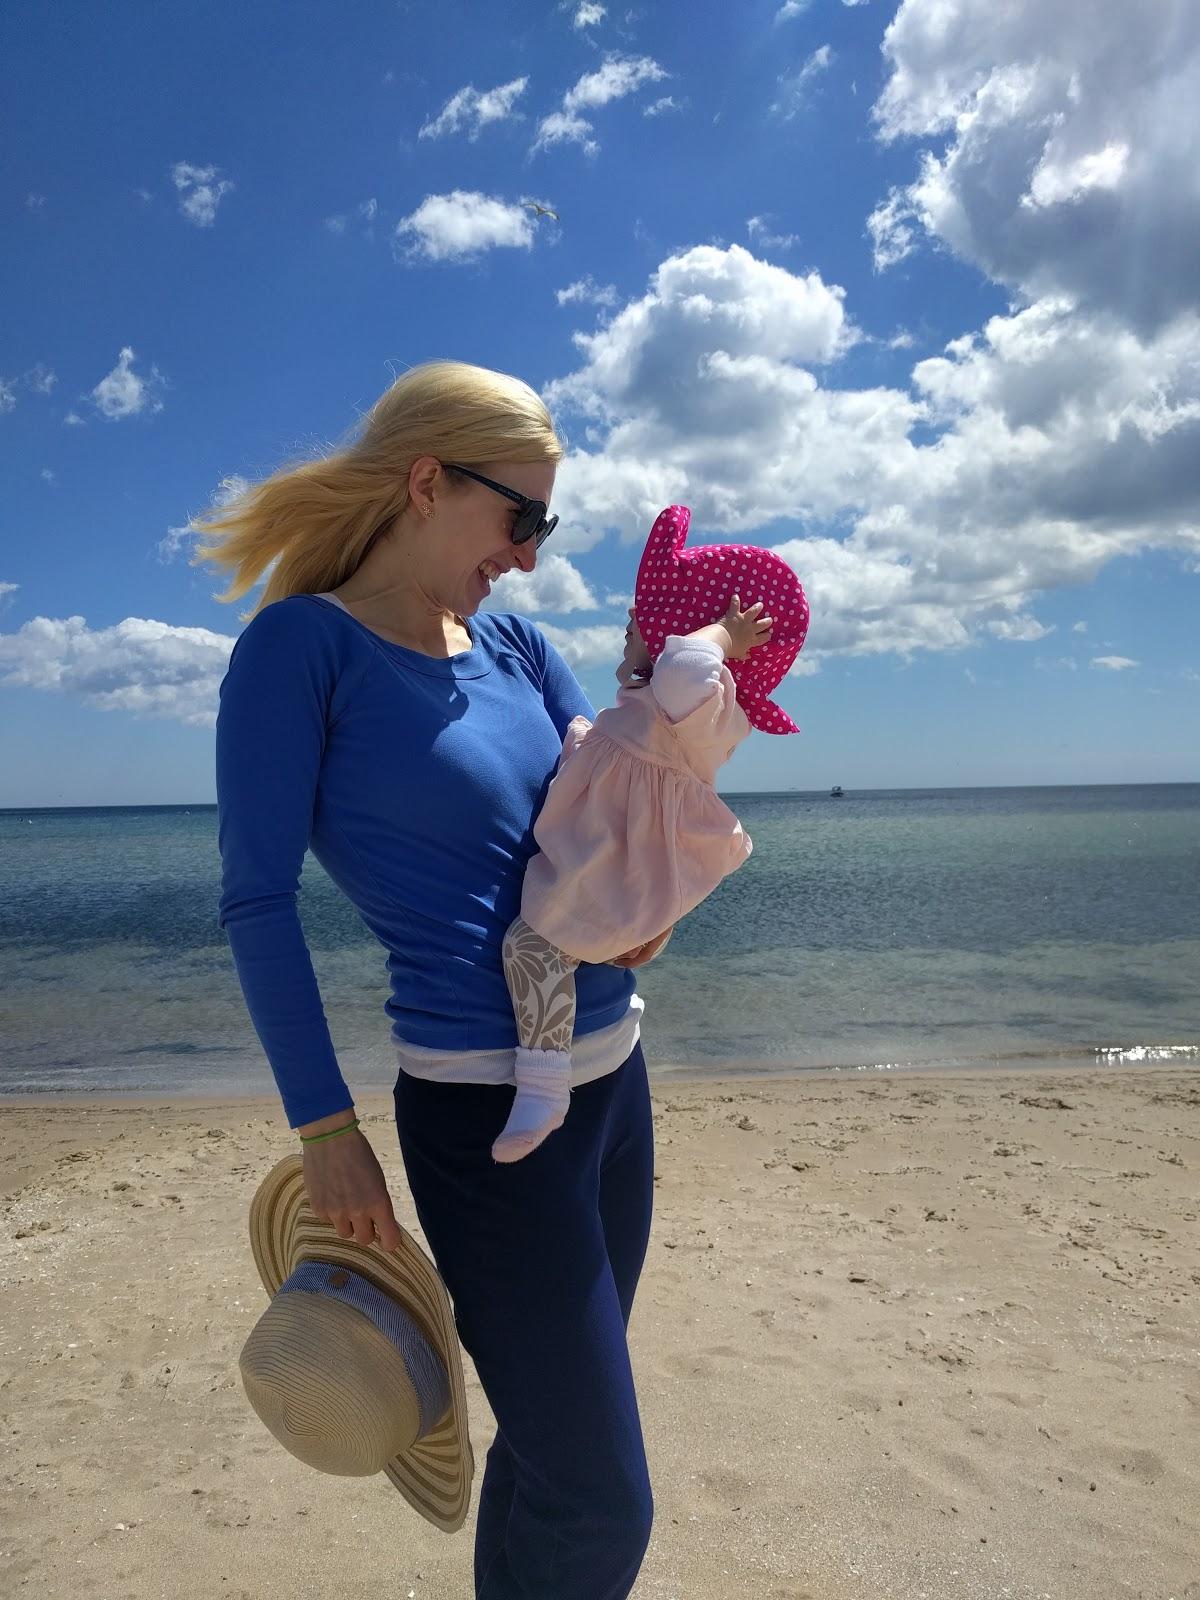 My daughter and I enjoying the Lake